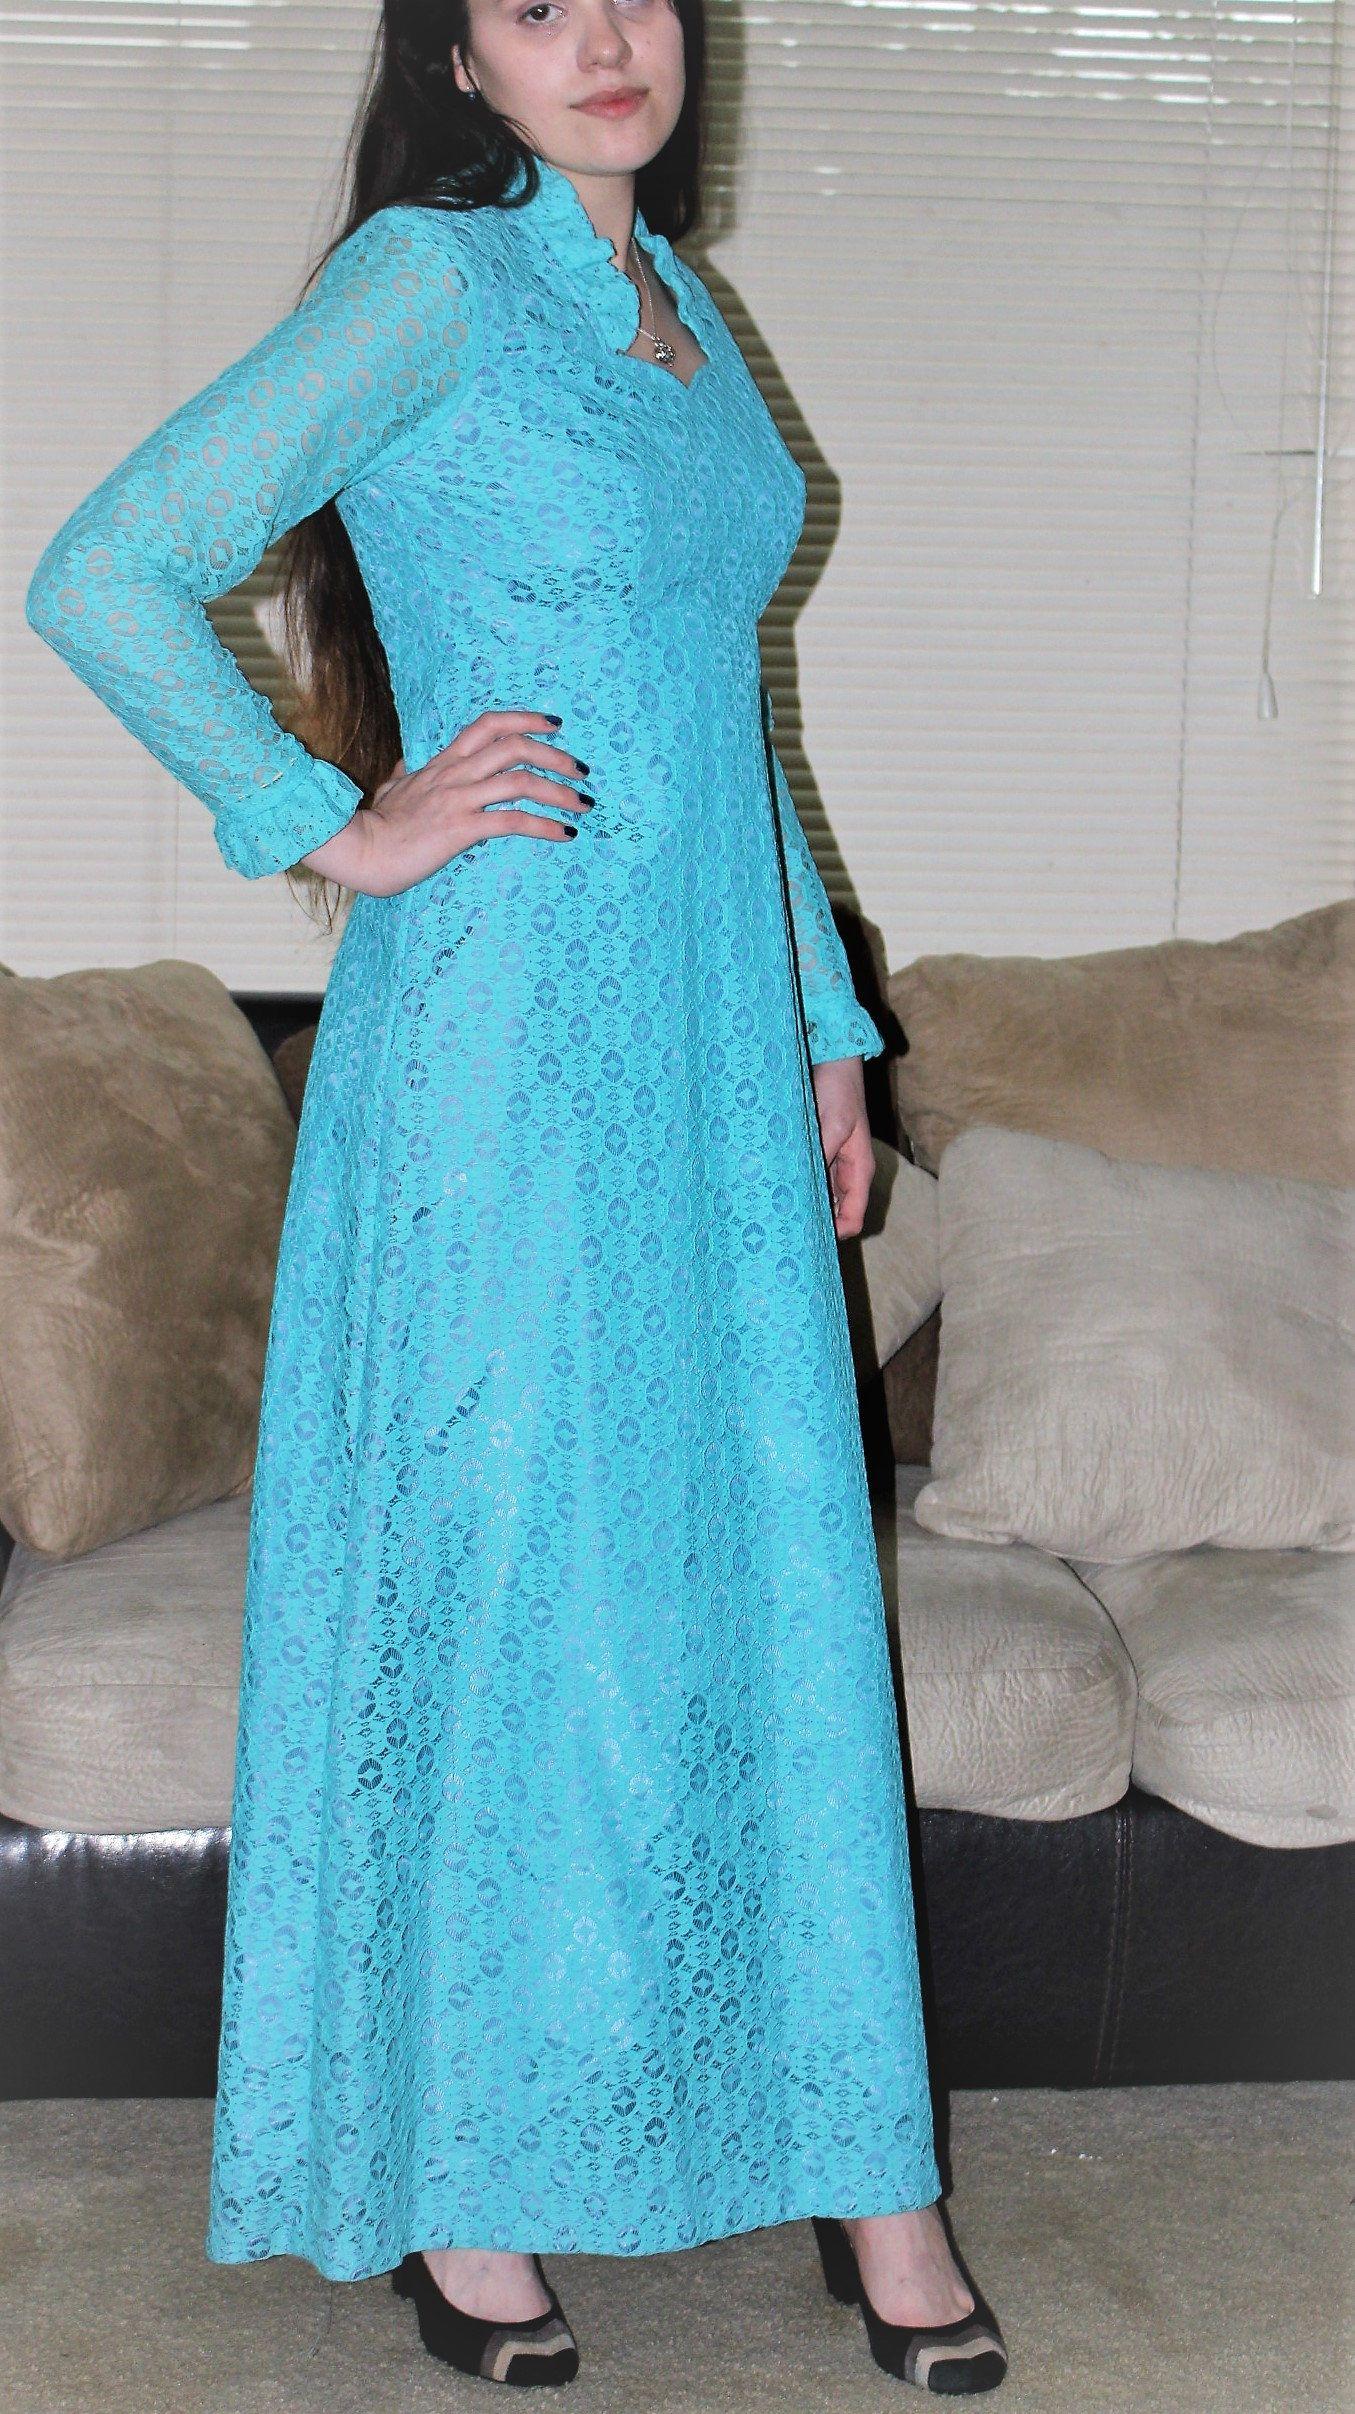 Vtg 70\'s Edwardian Lace Gunne Sax Style All Lace Maxi Dress.Blue All ...